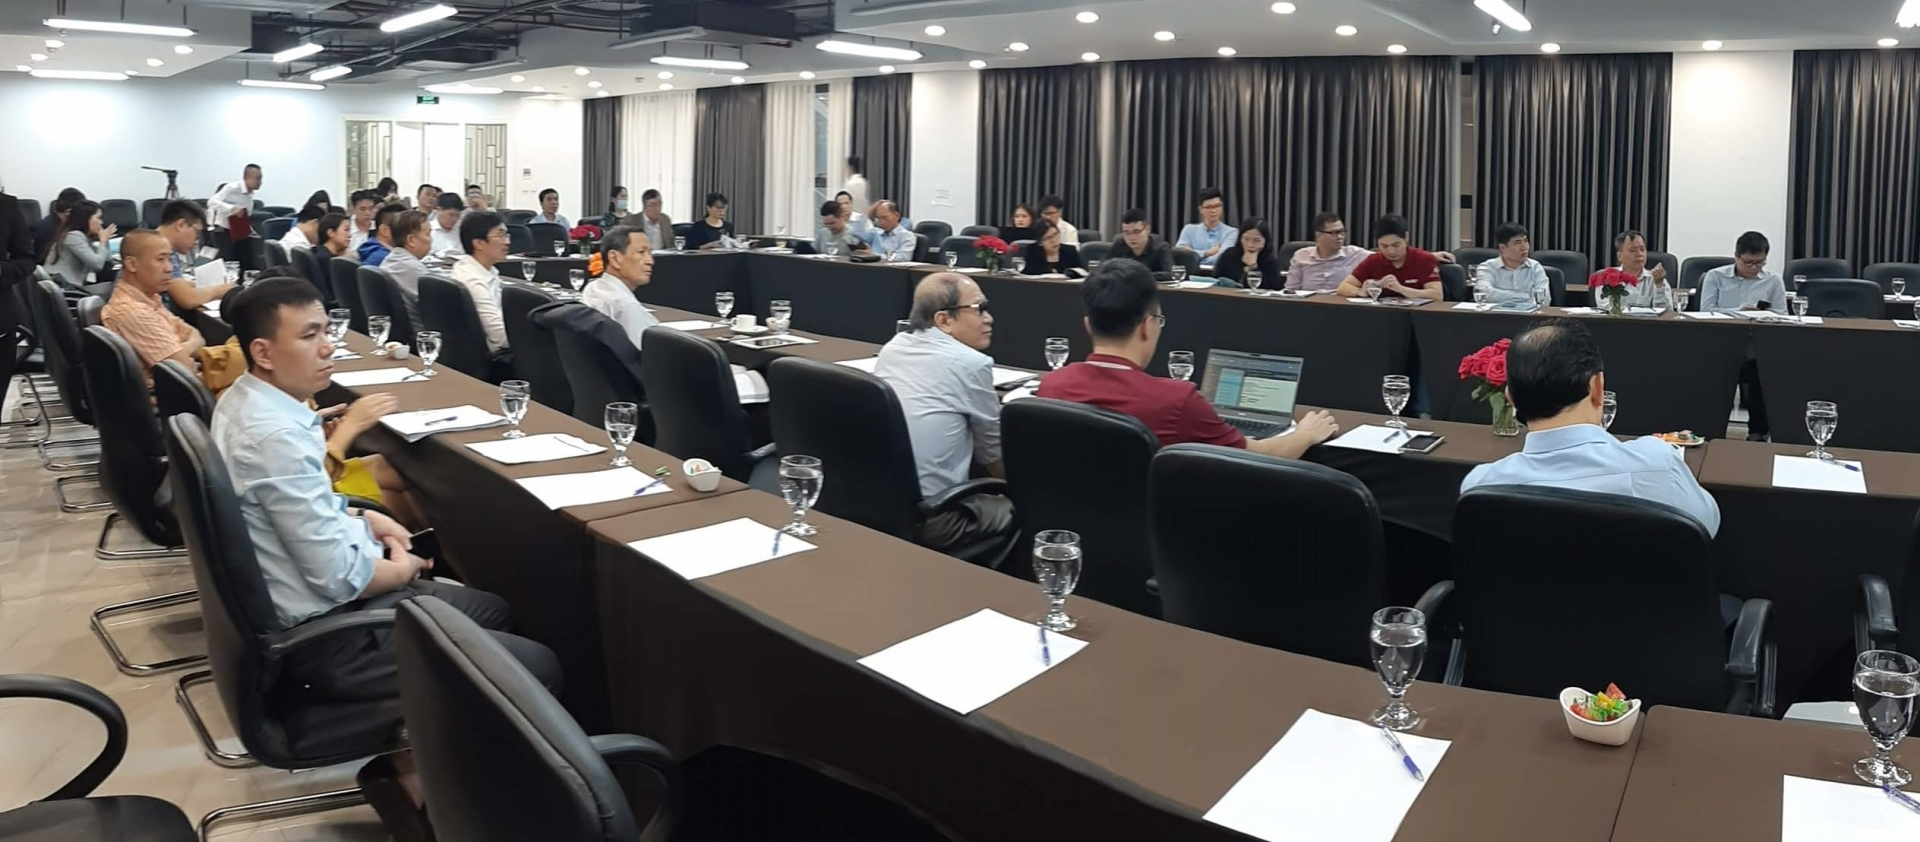 UNDP promoting green chemistry GC in enterprises and universities